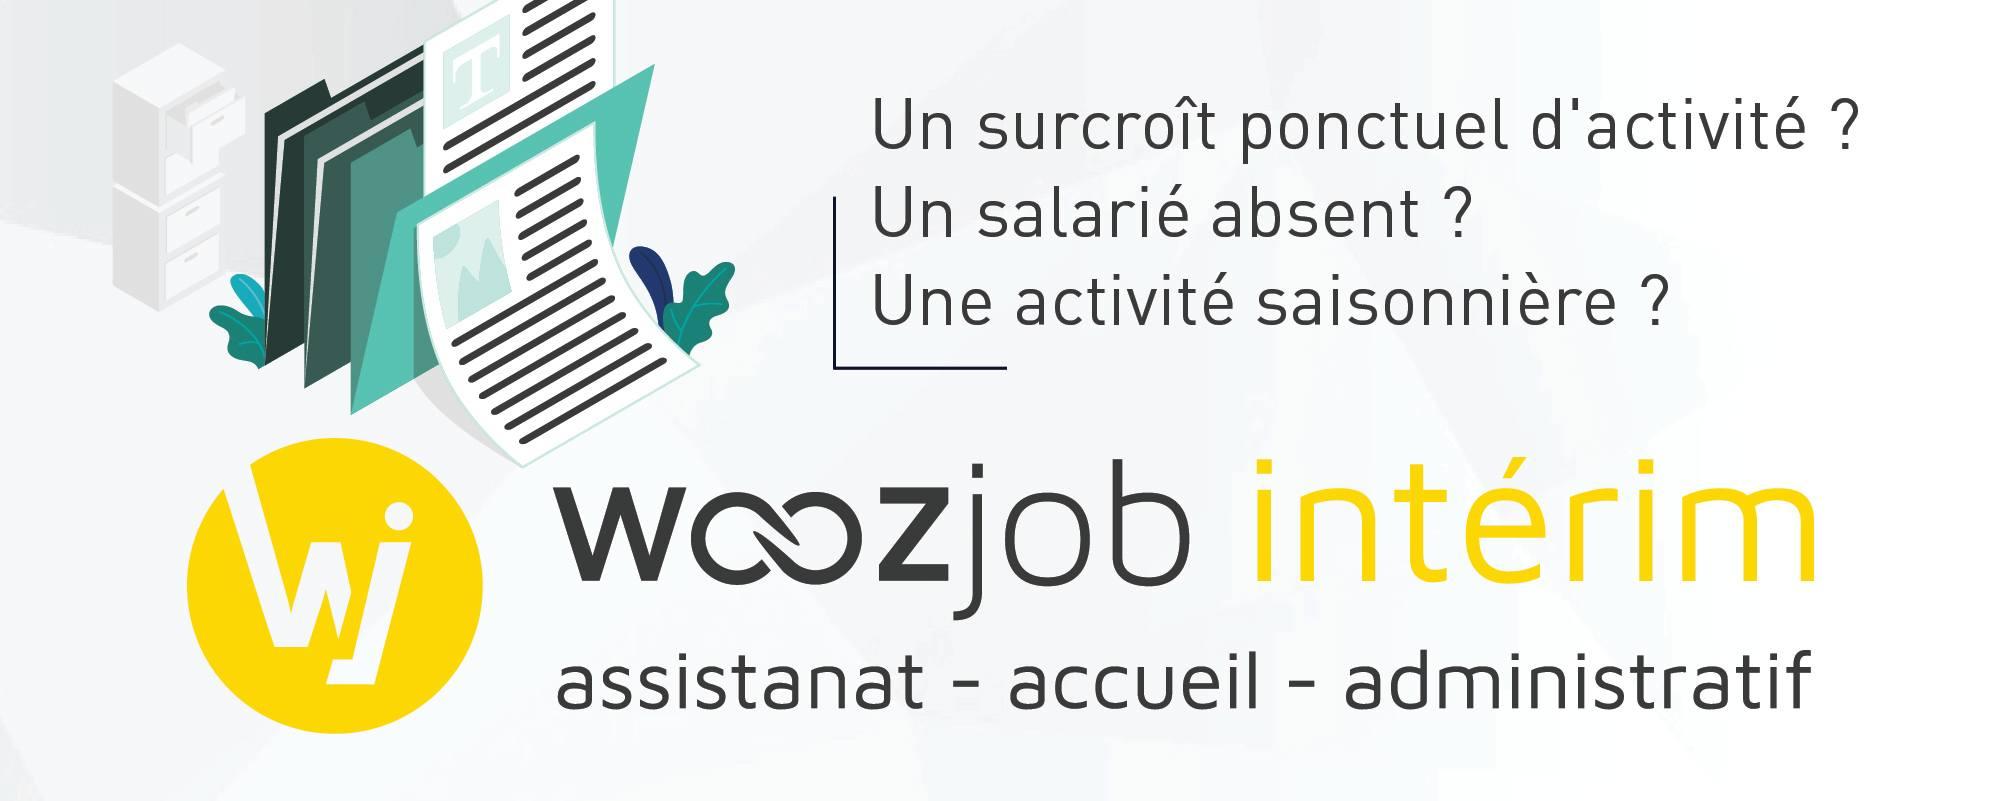 woozjob interim artisanat administratif accueil